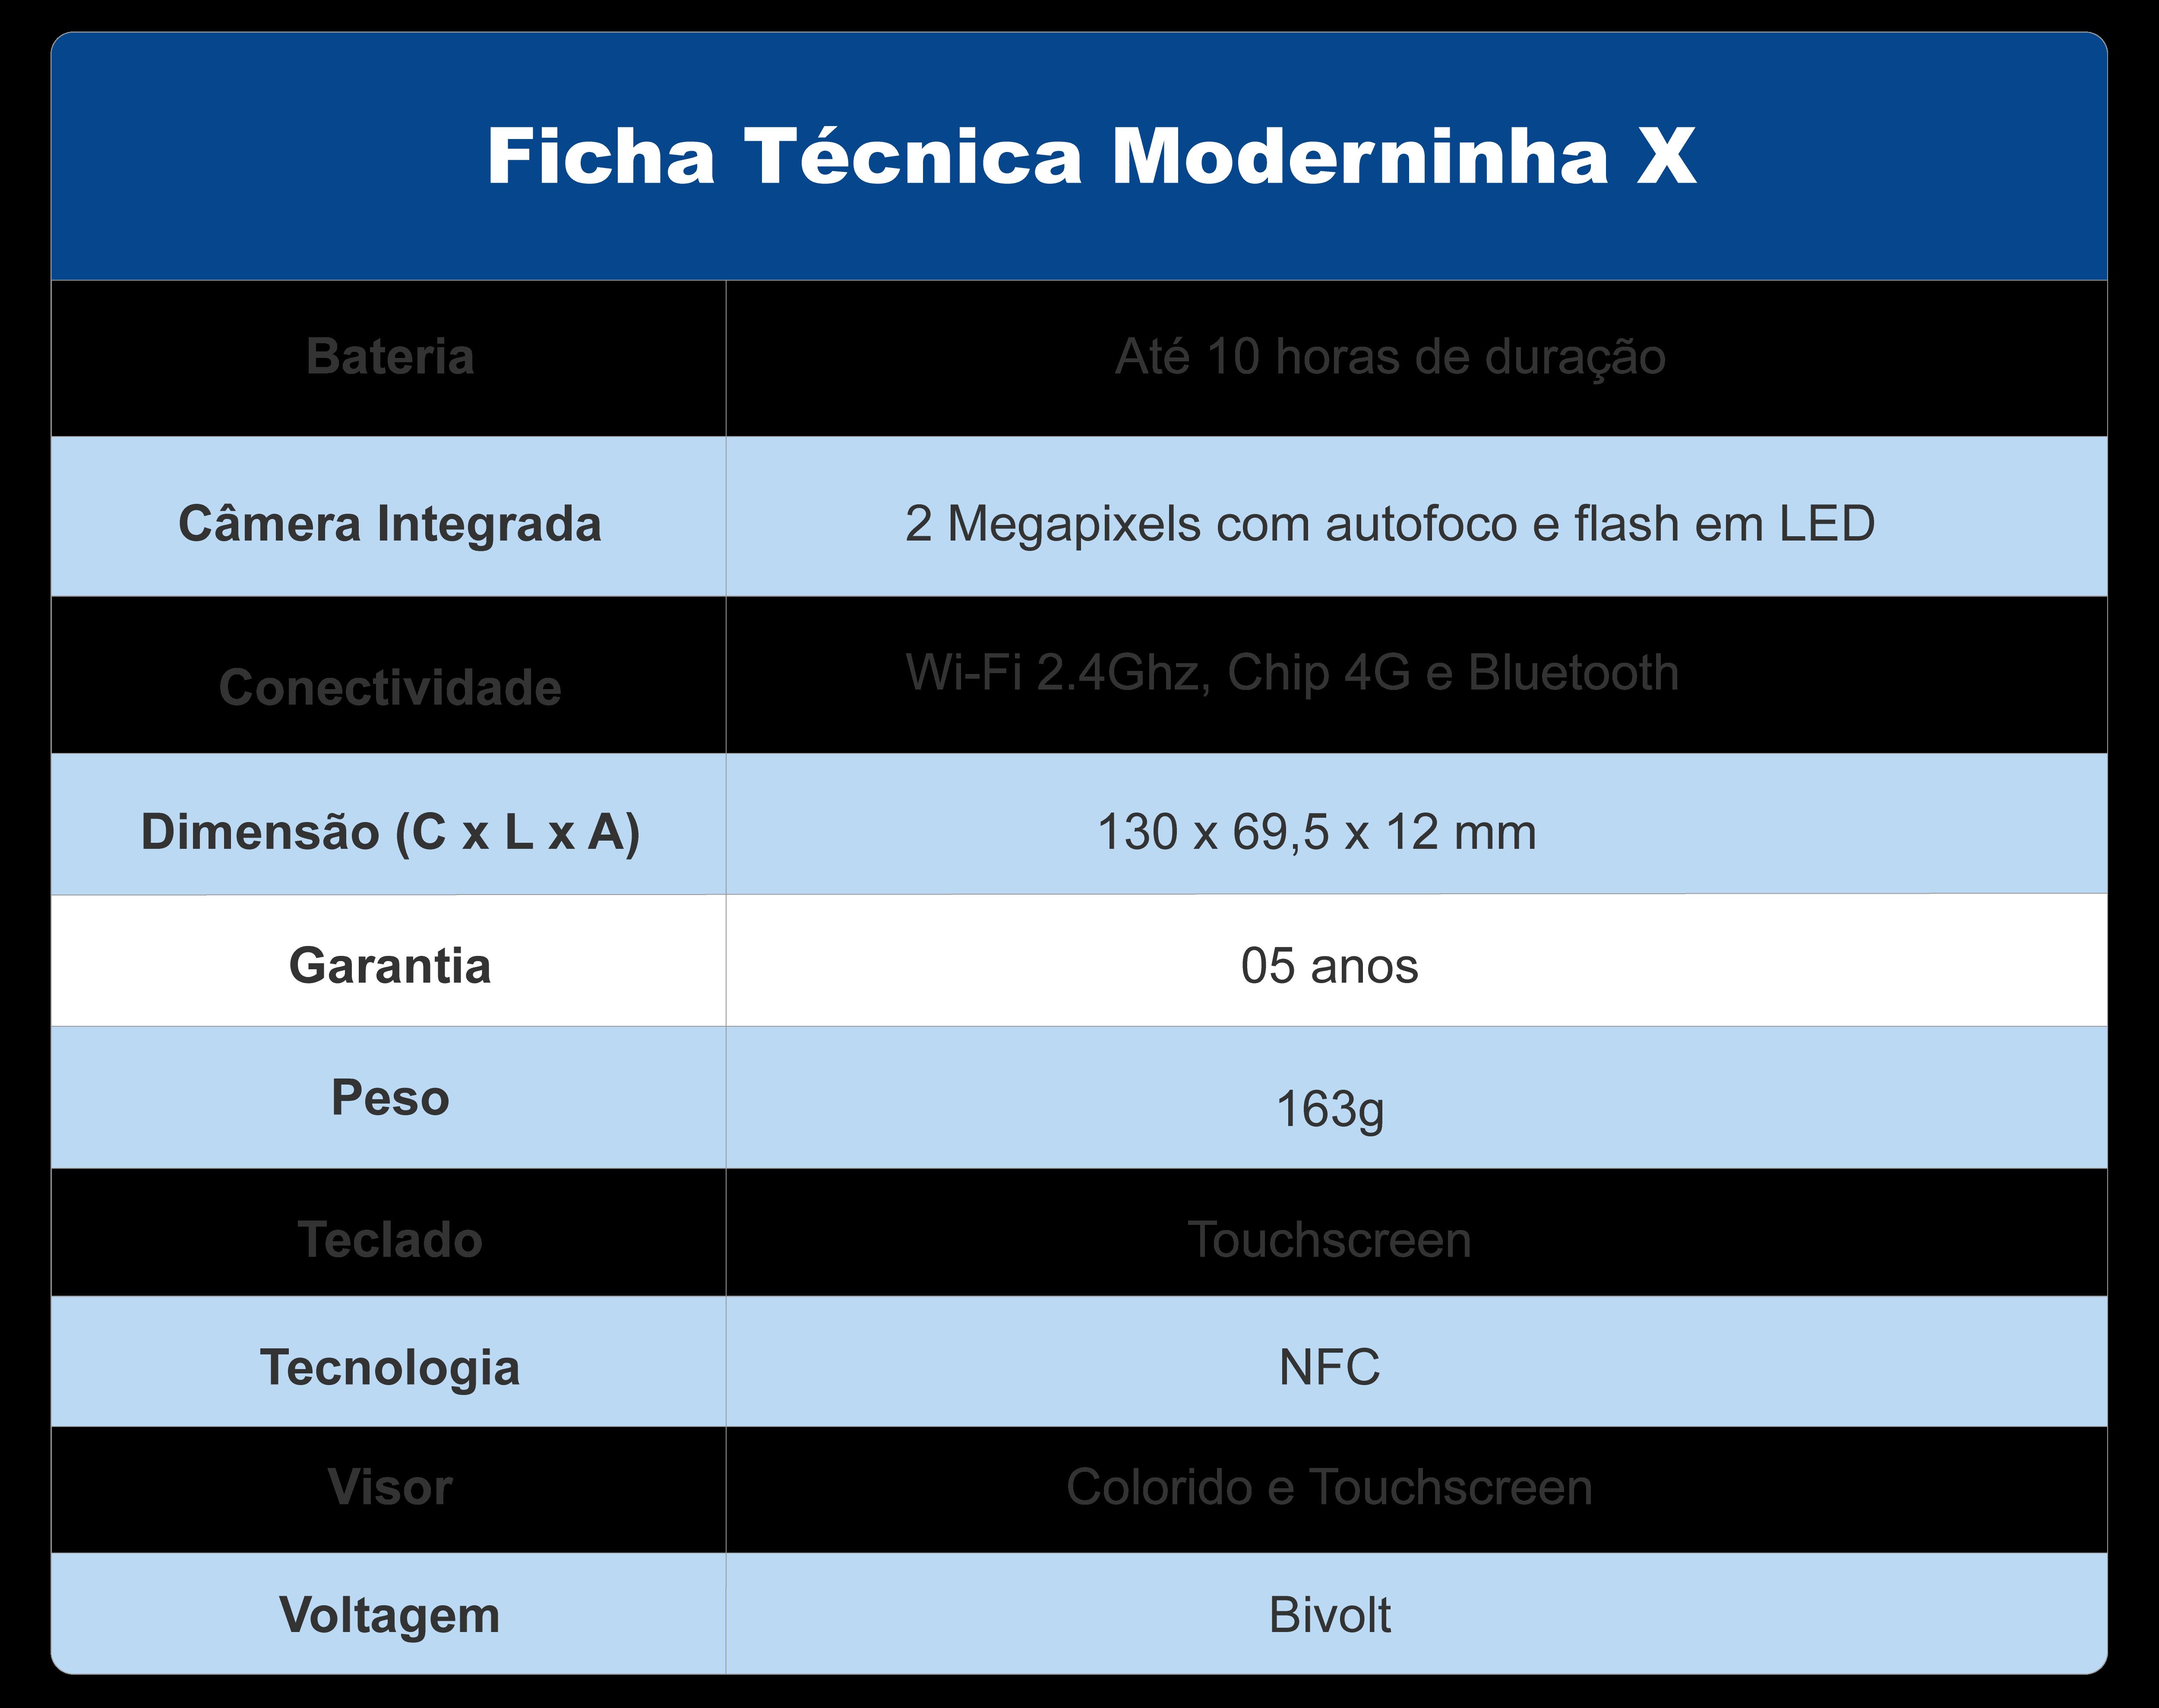 Moderninha X ficha -24